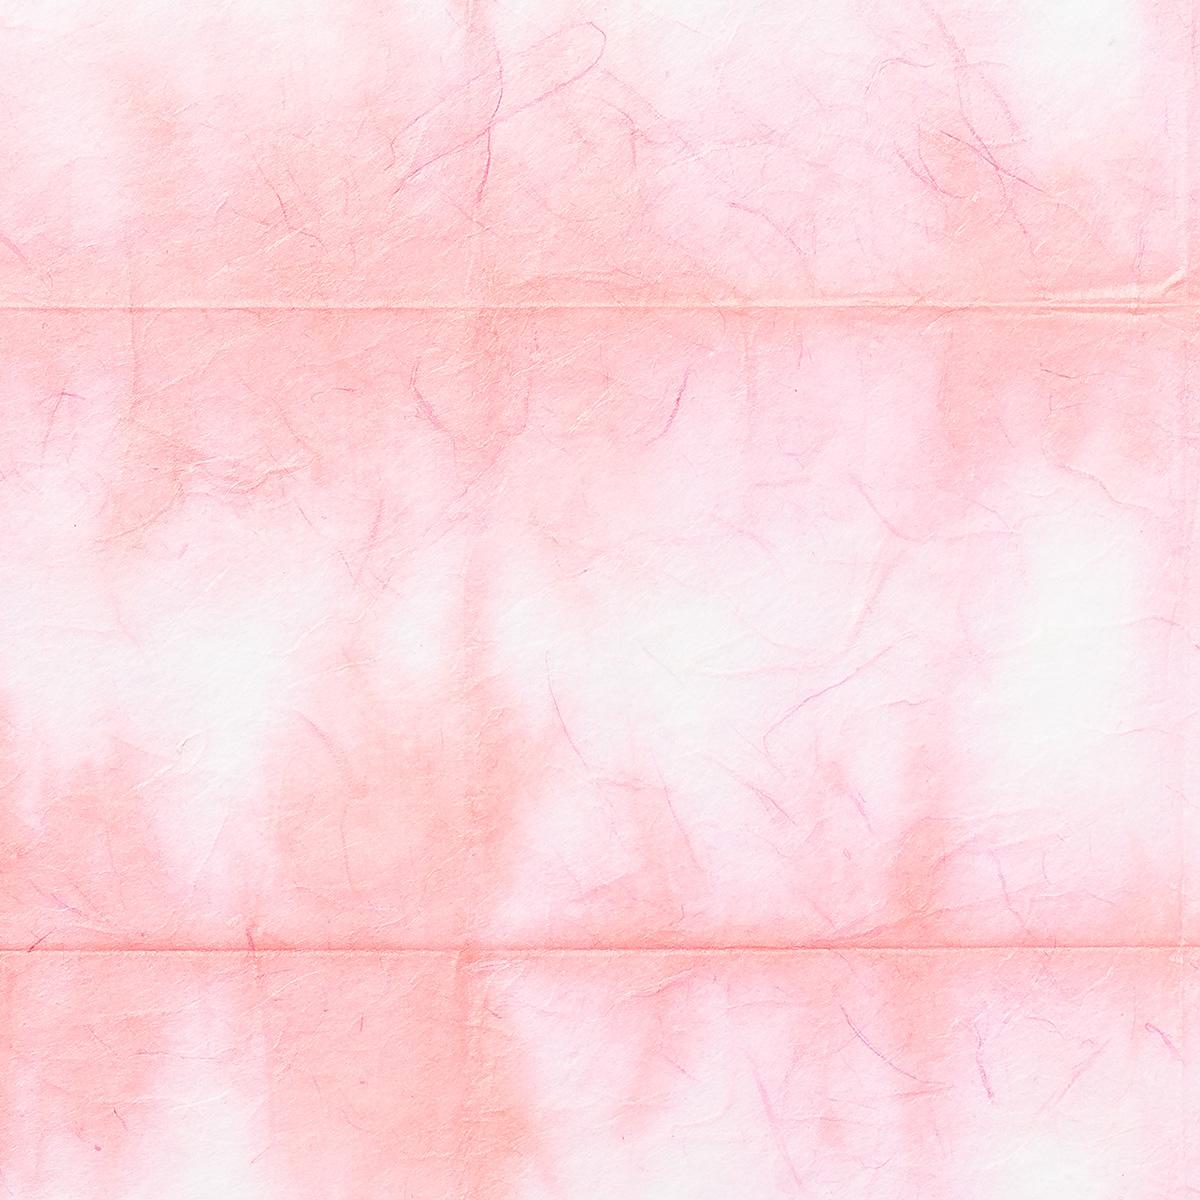 楮6匁 雲竜紙 板締め No.1